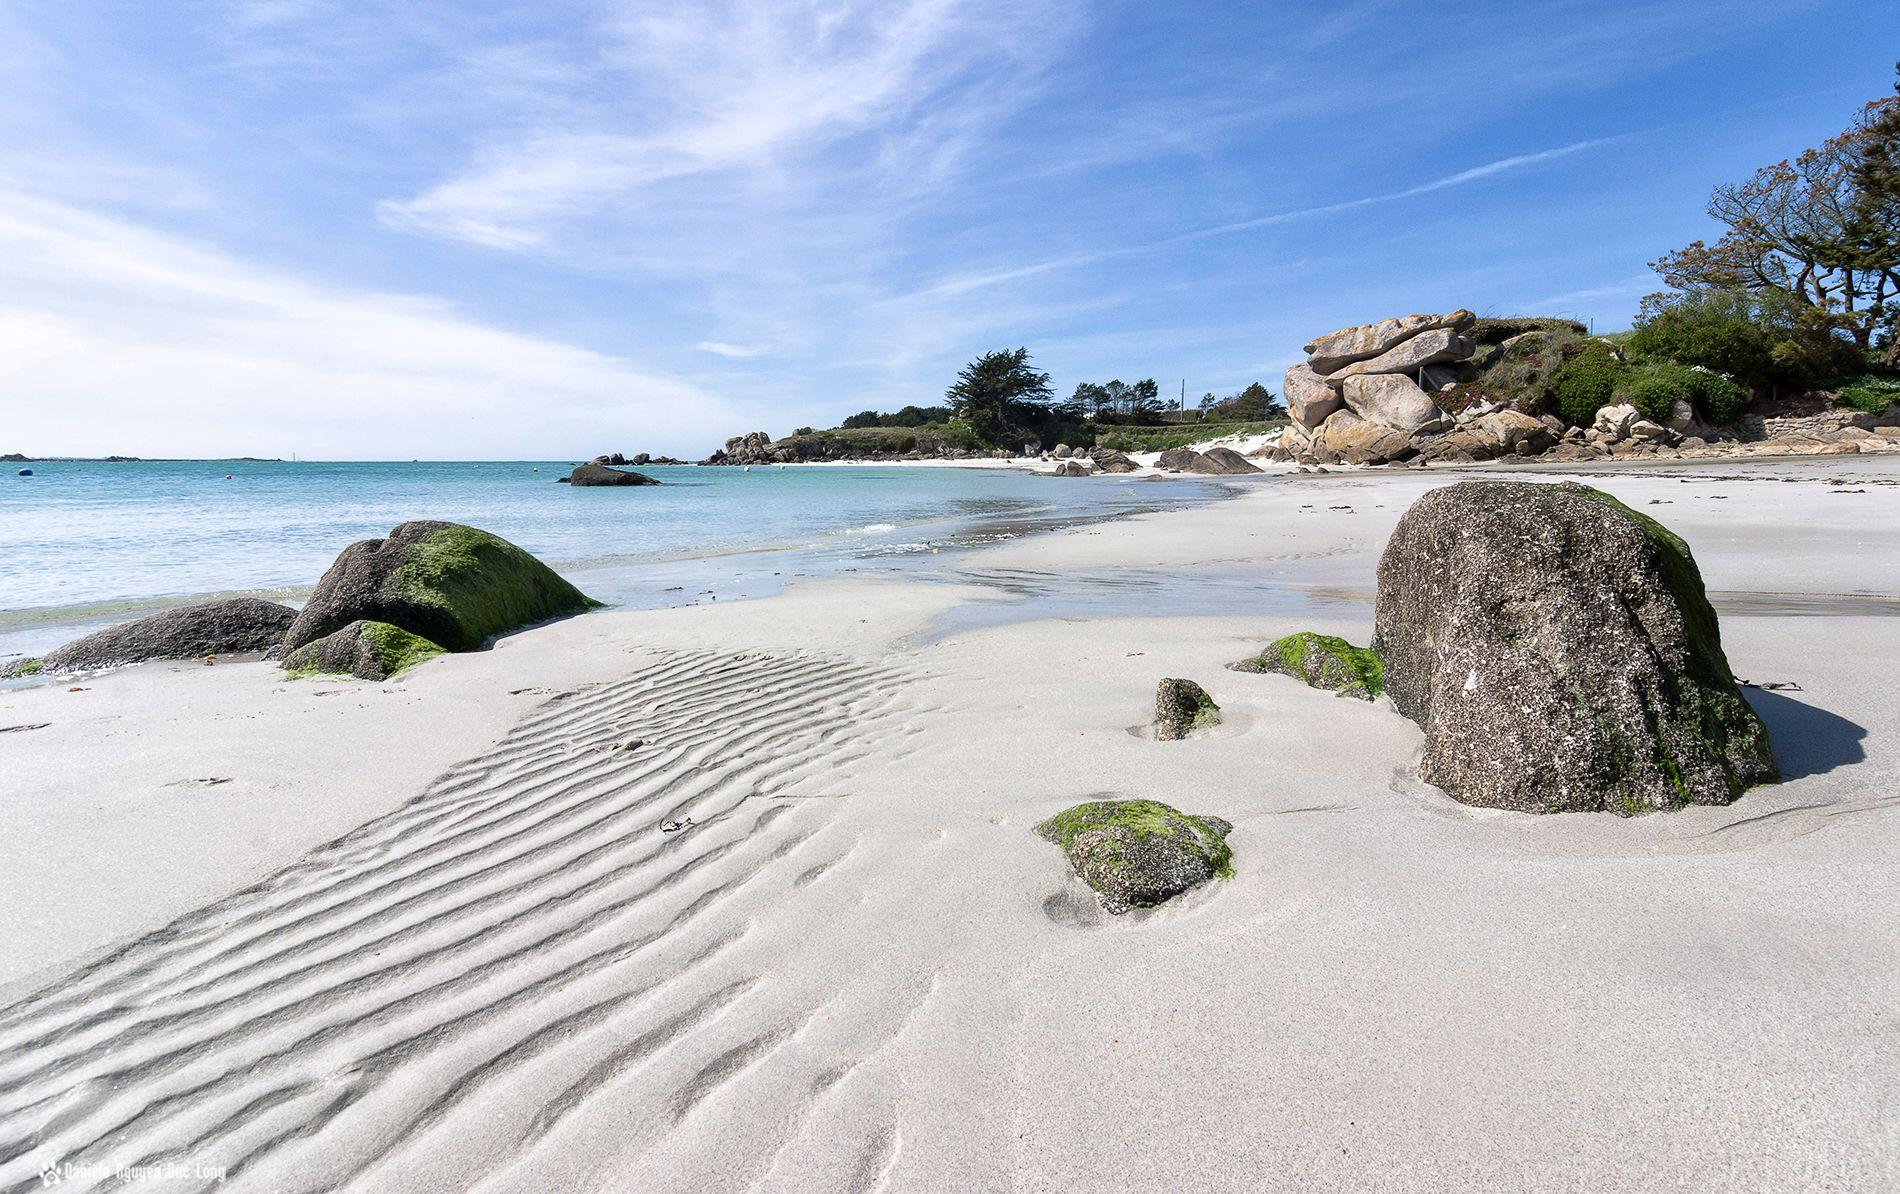 plage Poulfeunteun 1 copie plage sable blanc Poulfeunteun